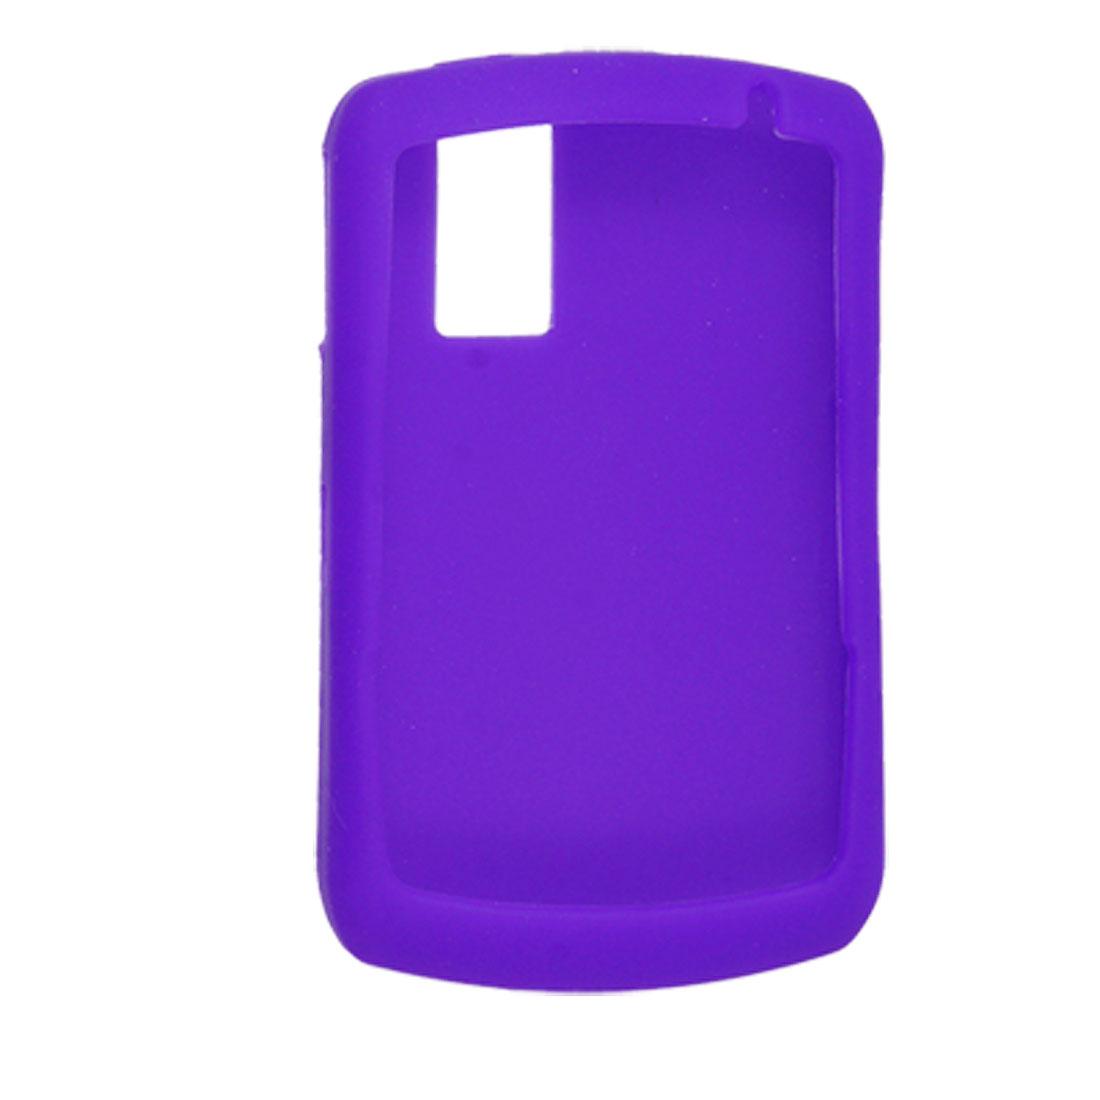 Purple Silicone Case Protector for BlackBerry 8300 8310 8320